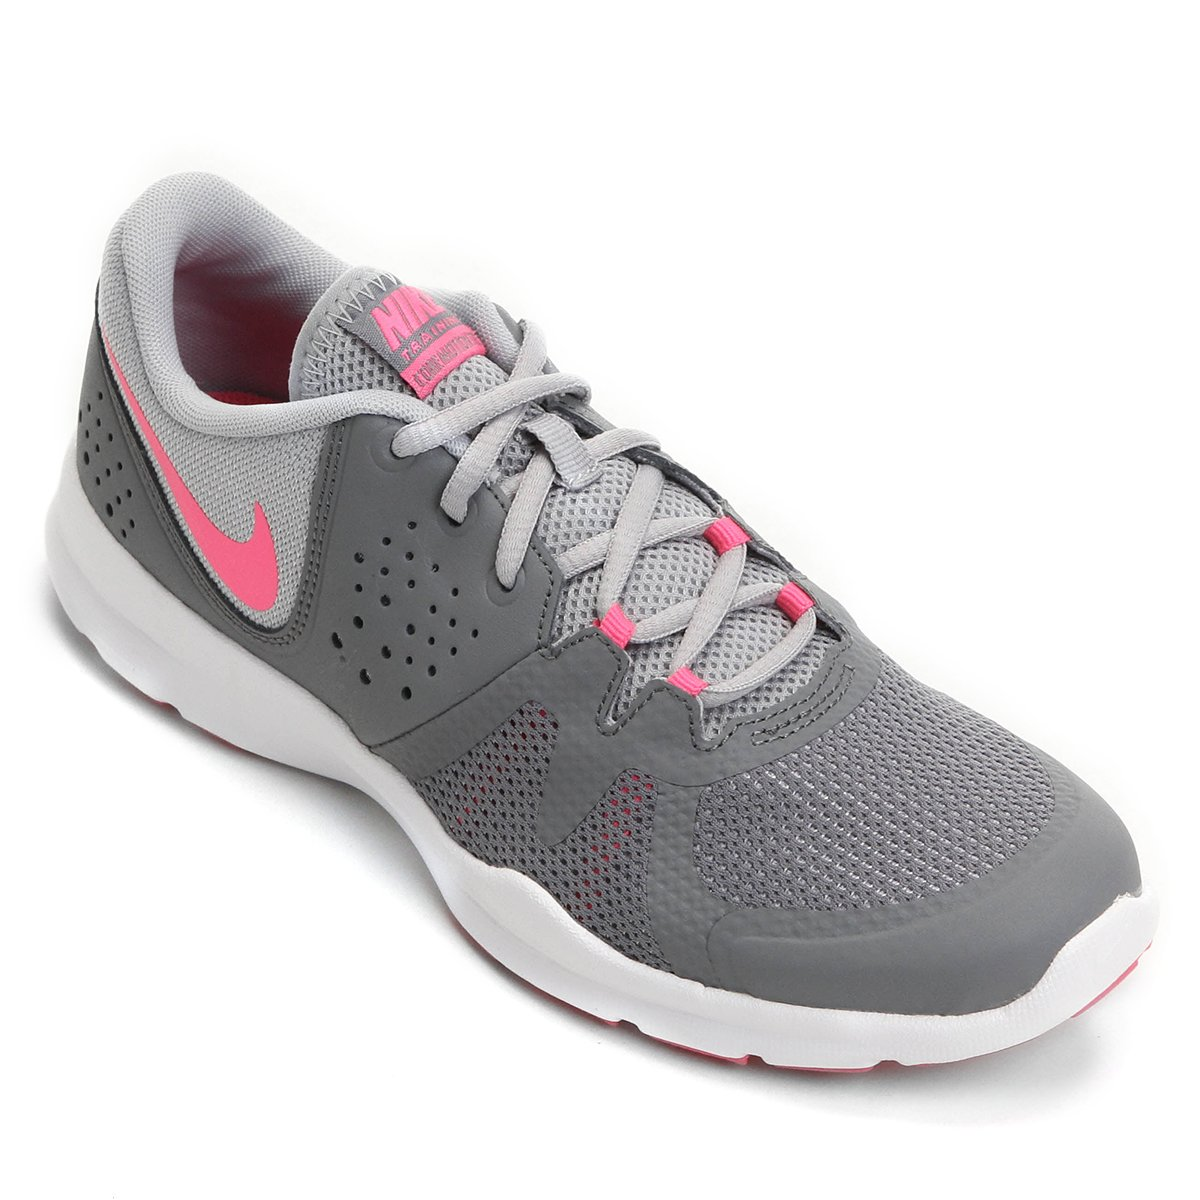 97961aa3f83 Tênis Nike Core Motion Tr 3 Mesh Feminino - Compre Agora